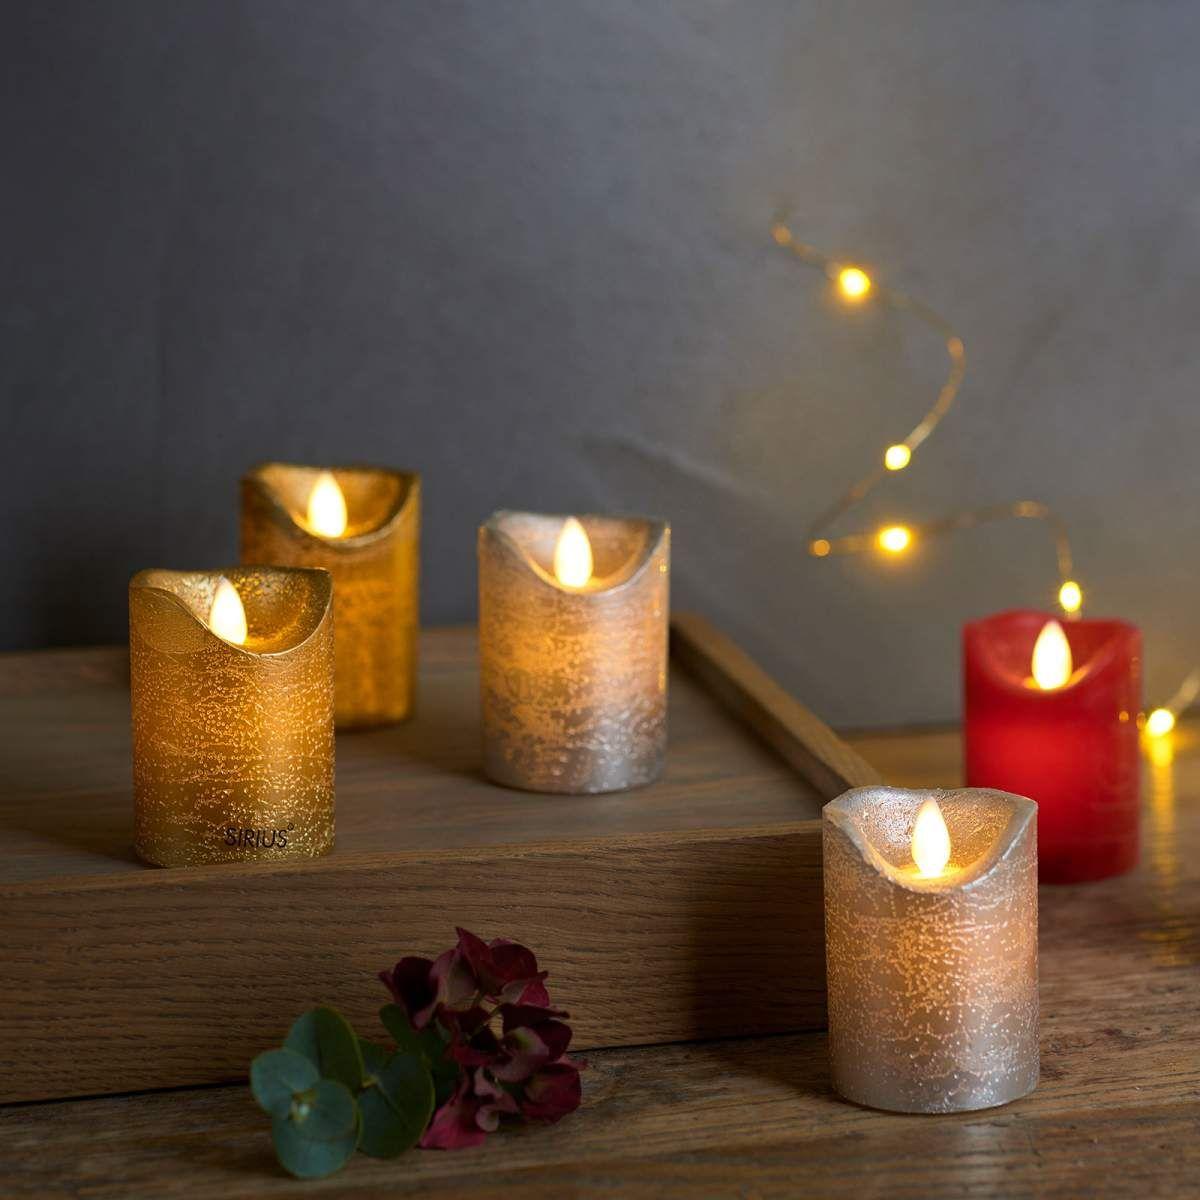 Led Kerze Sara Von Sirius Silber Led Kerzen Led Und Kerzen